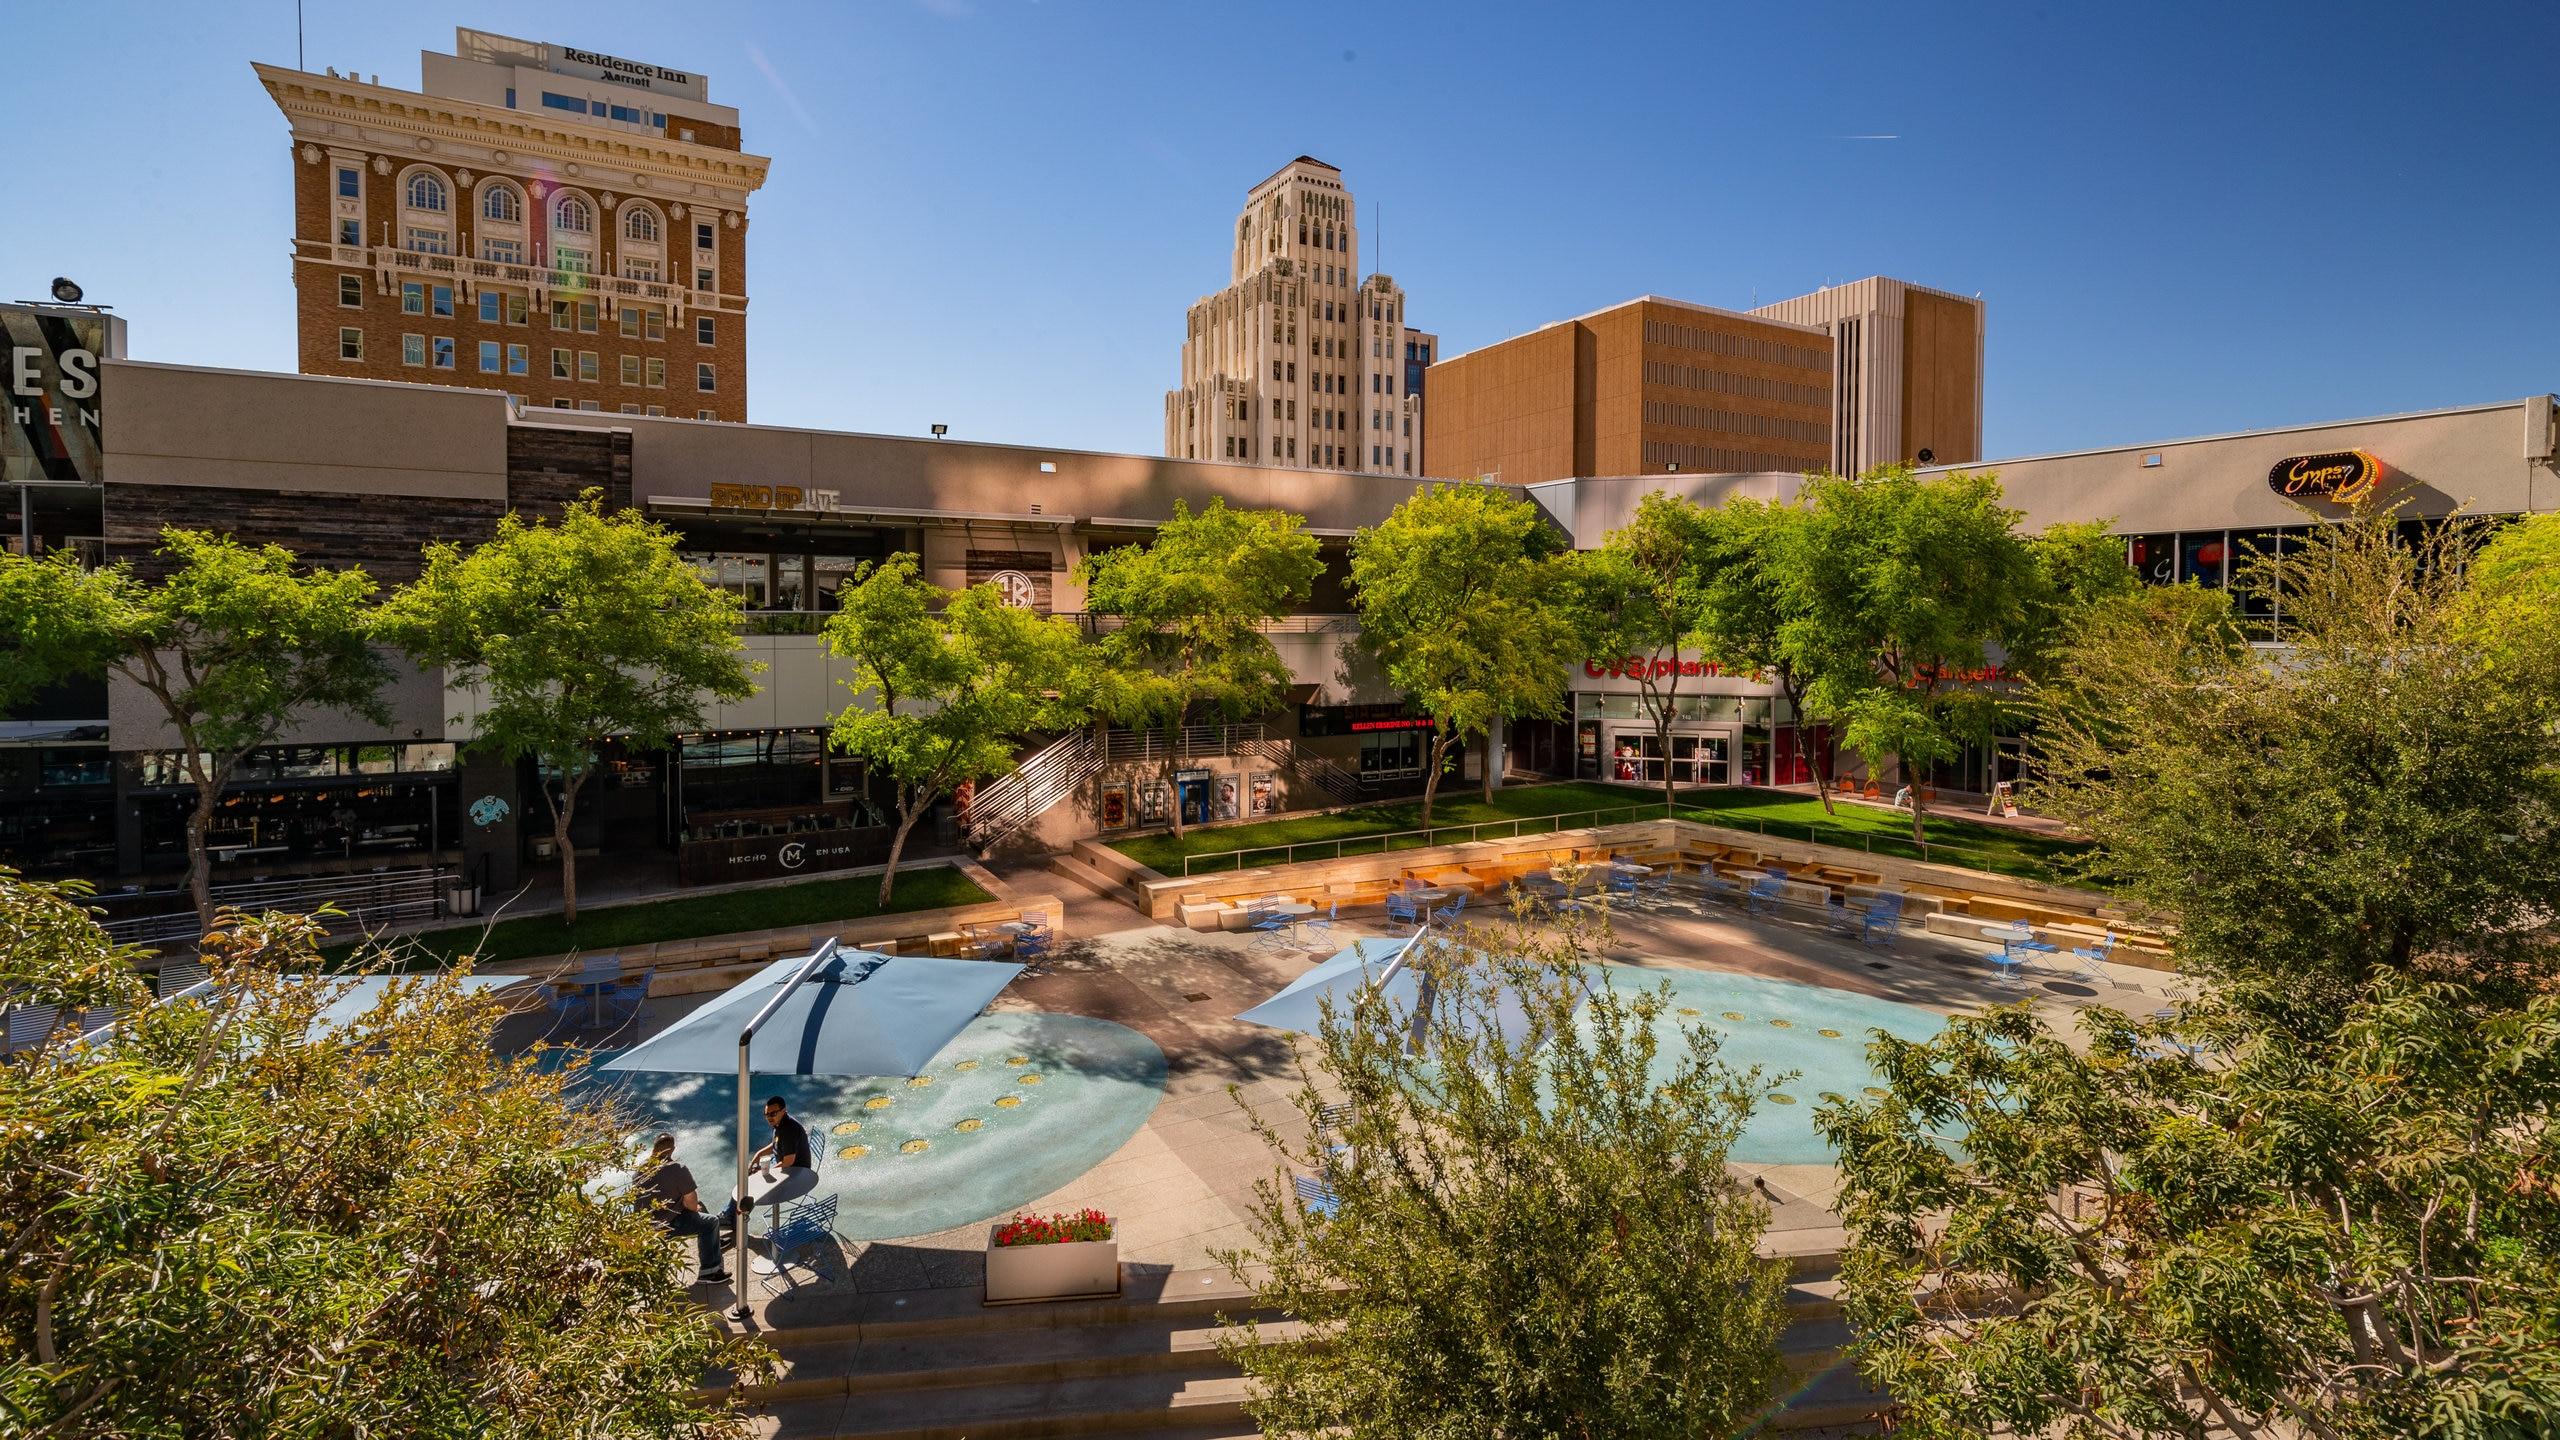 Reisetipps Phoenix 2021 Das Beste In Phoenix Entdecken Expedia